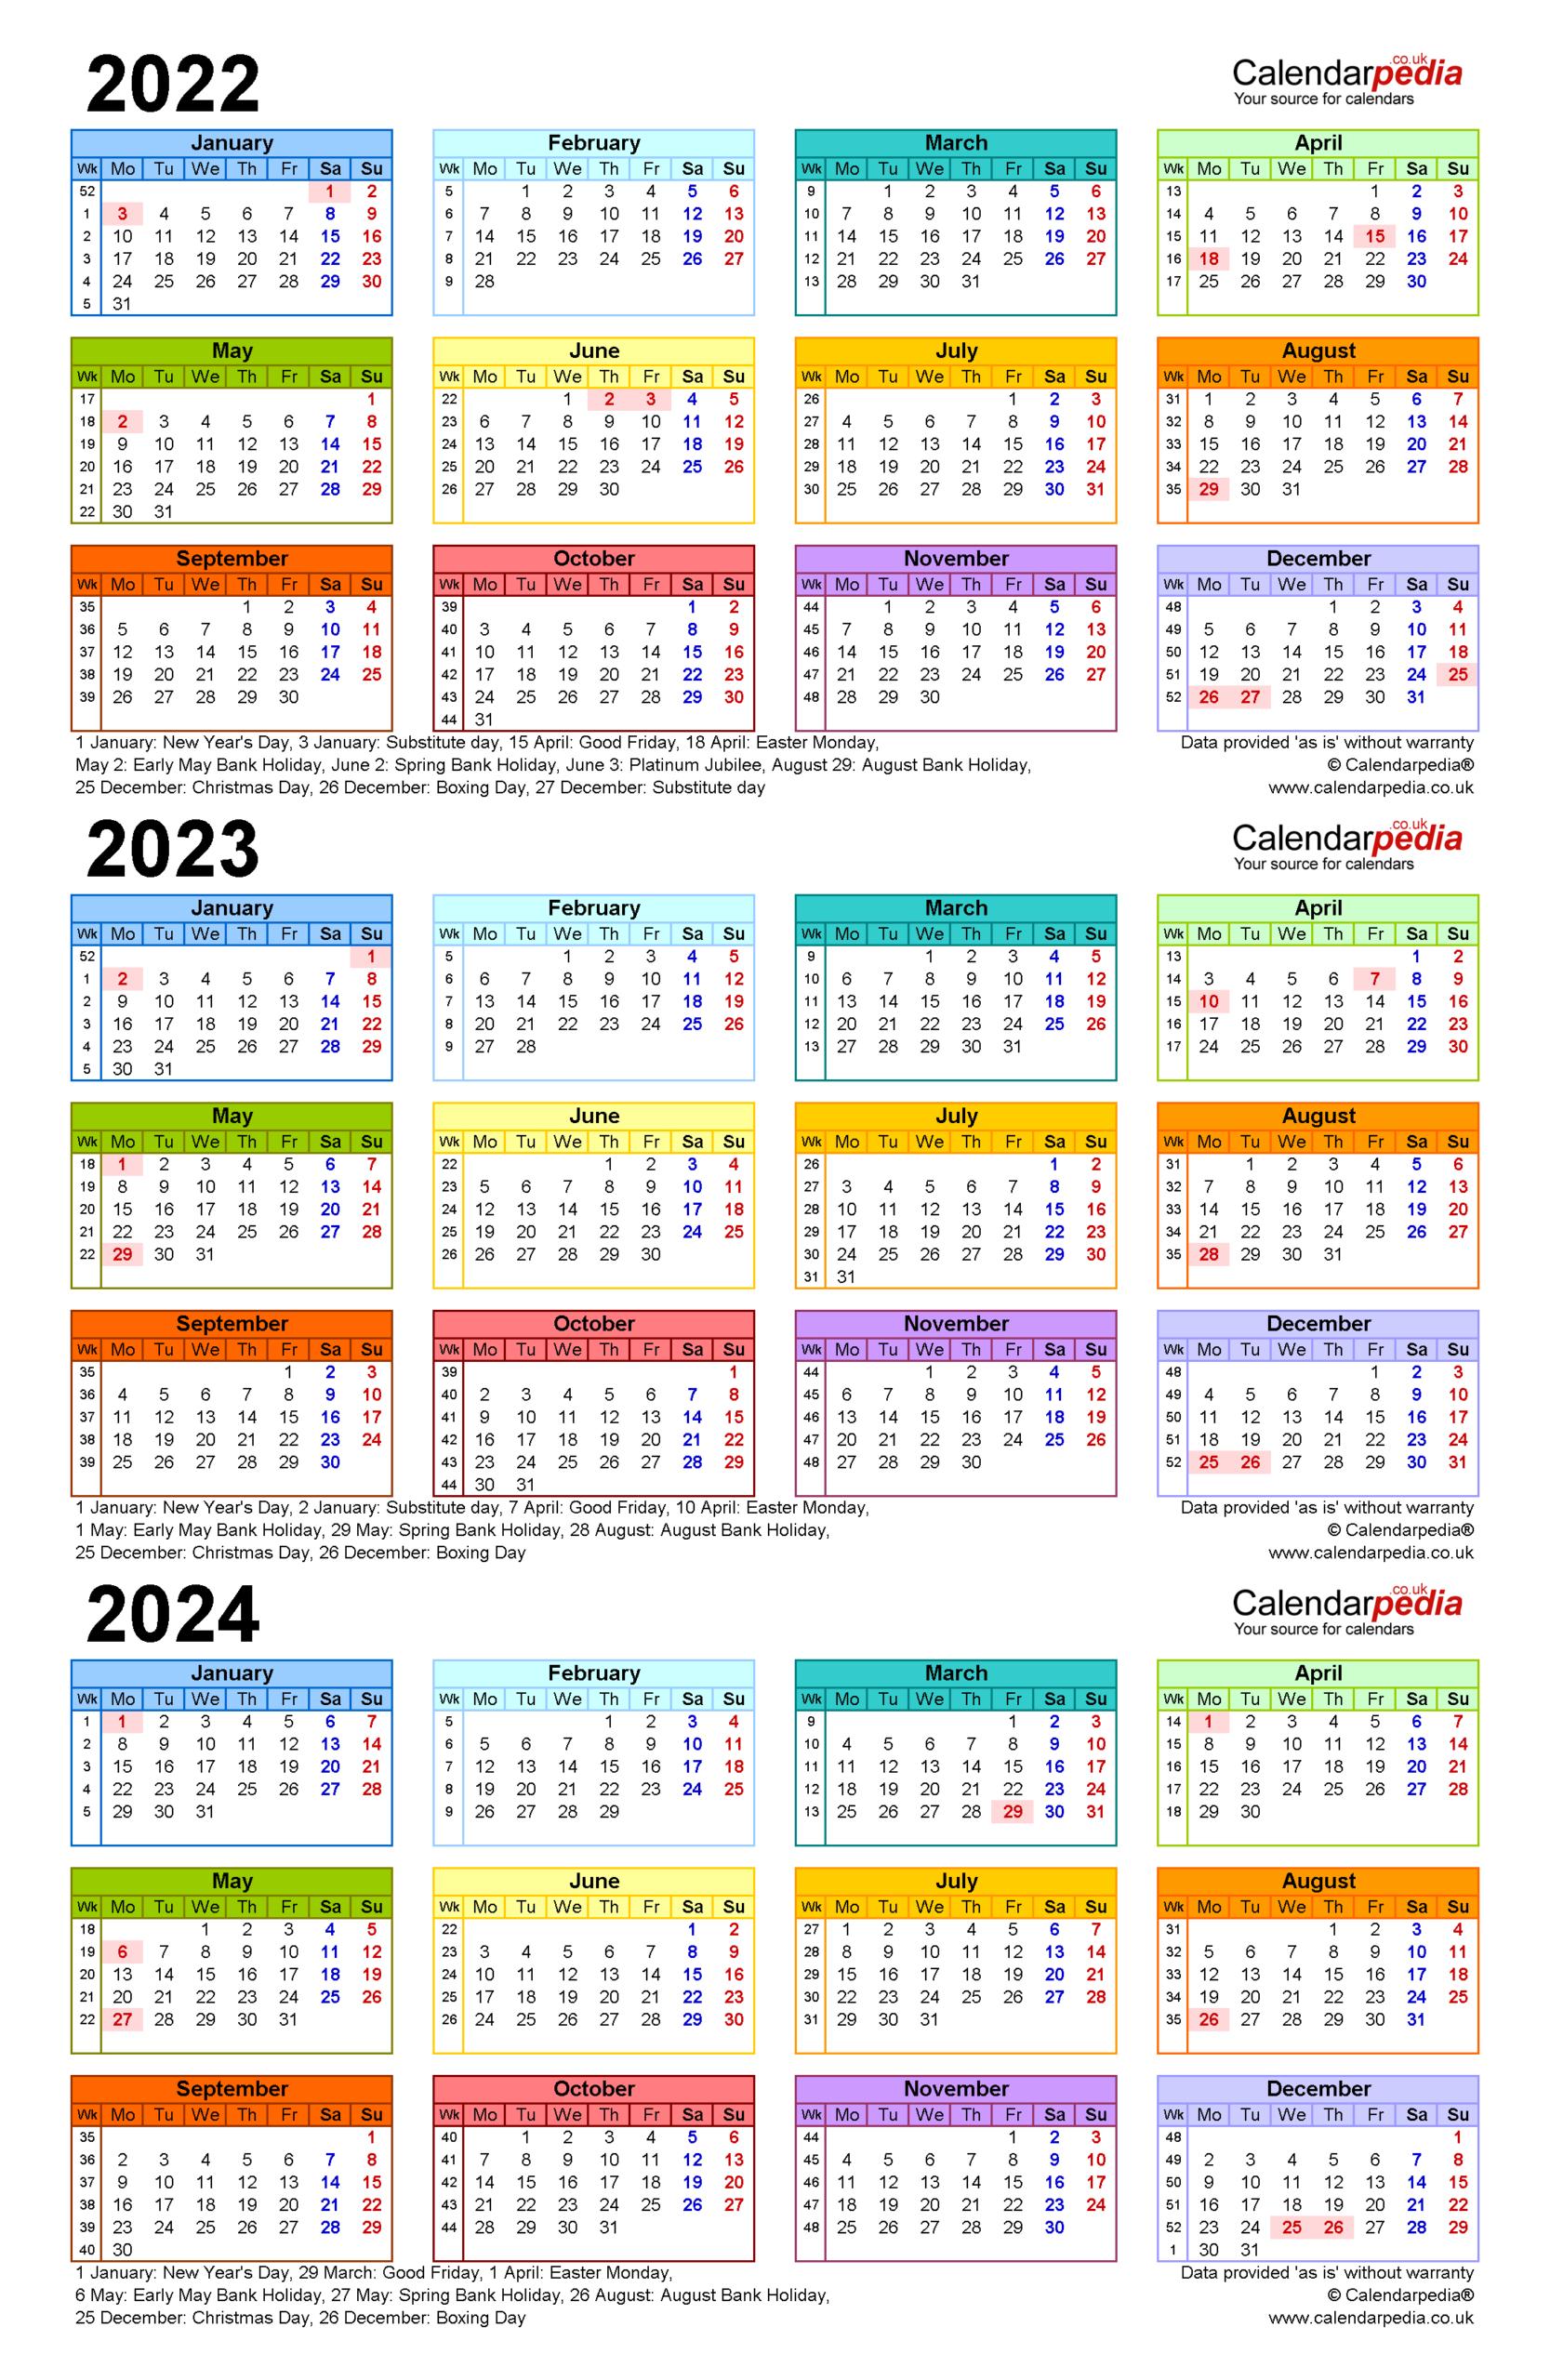 Three Year Calendars For 2022, 2023 & 2024 (Uk) For Pdf with regard to 2022 2023 School Calendar North Penn